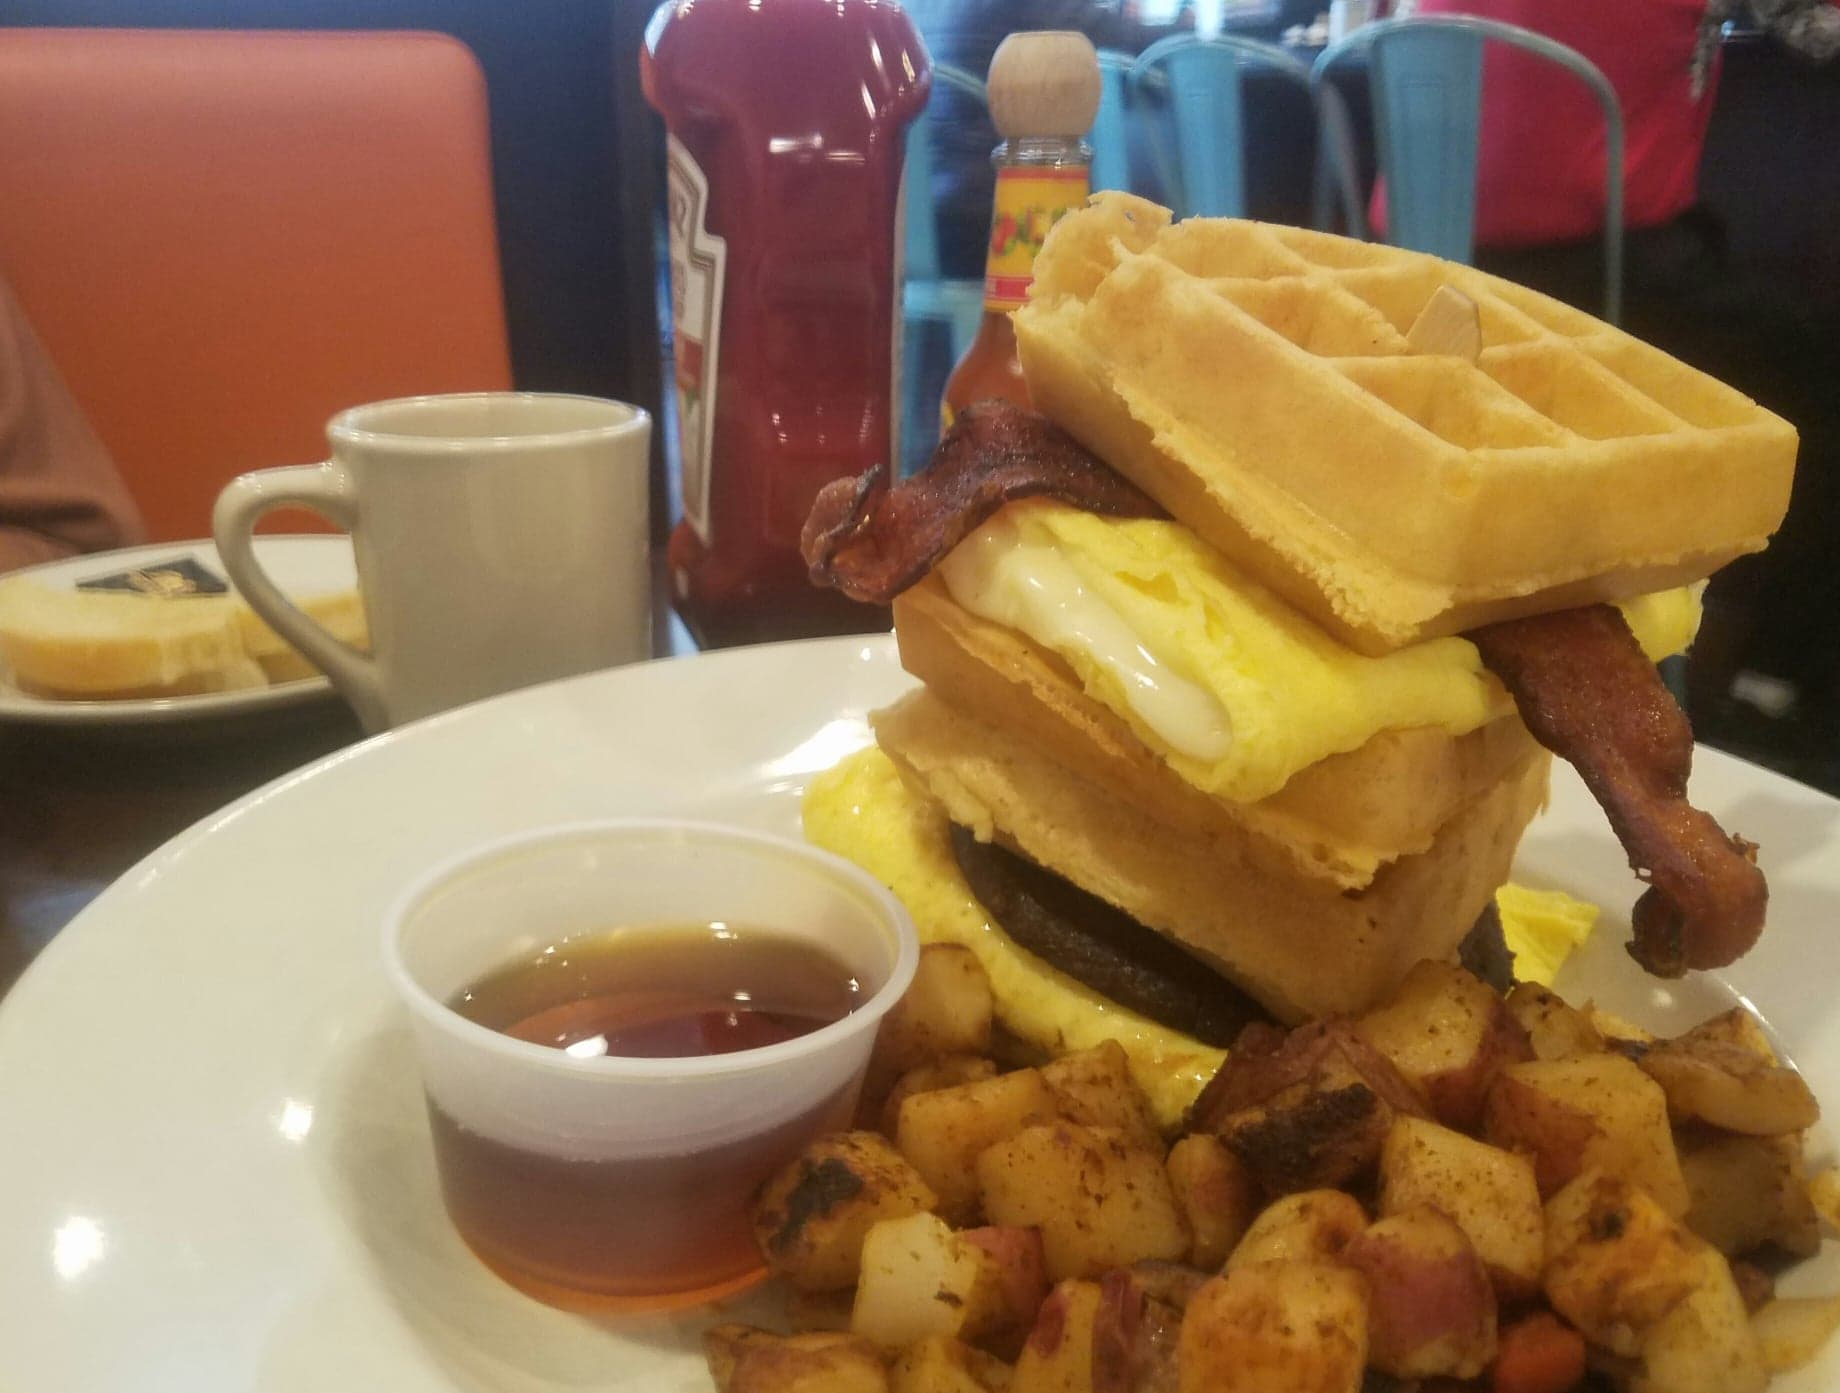 breakfast club sandwich, waffles